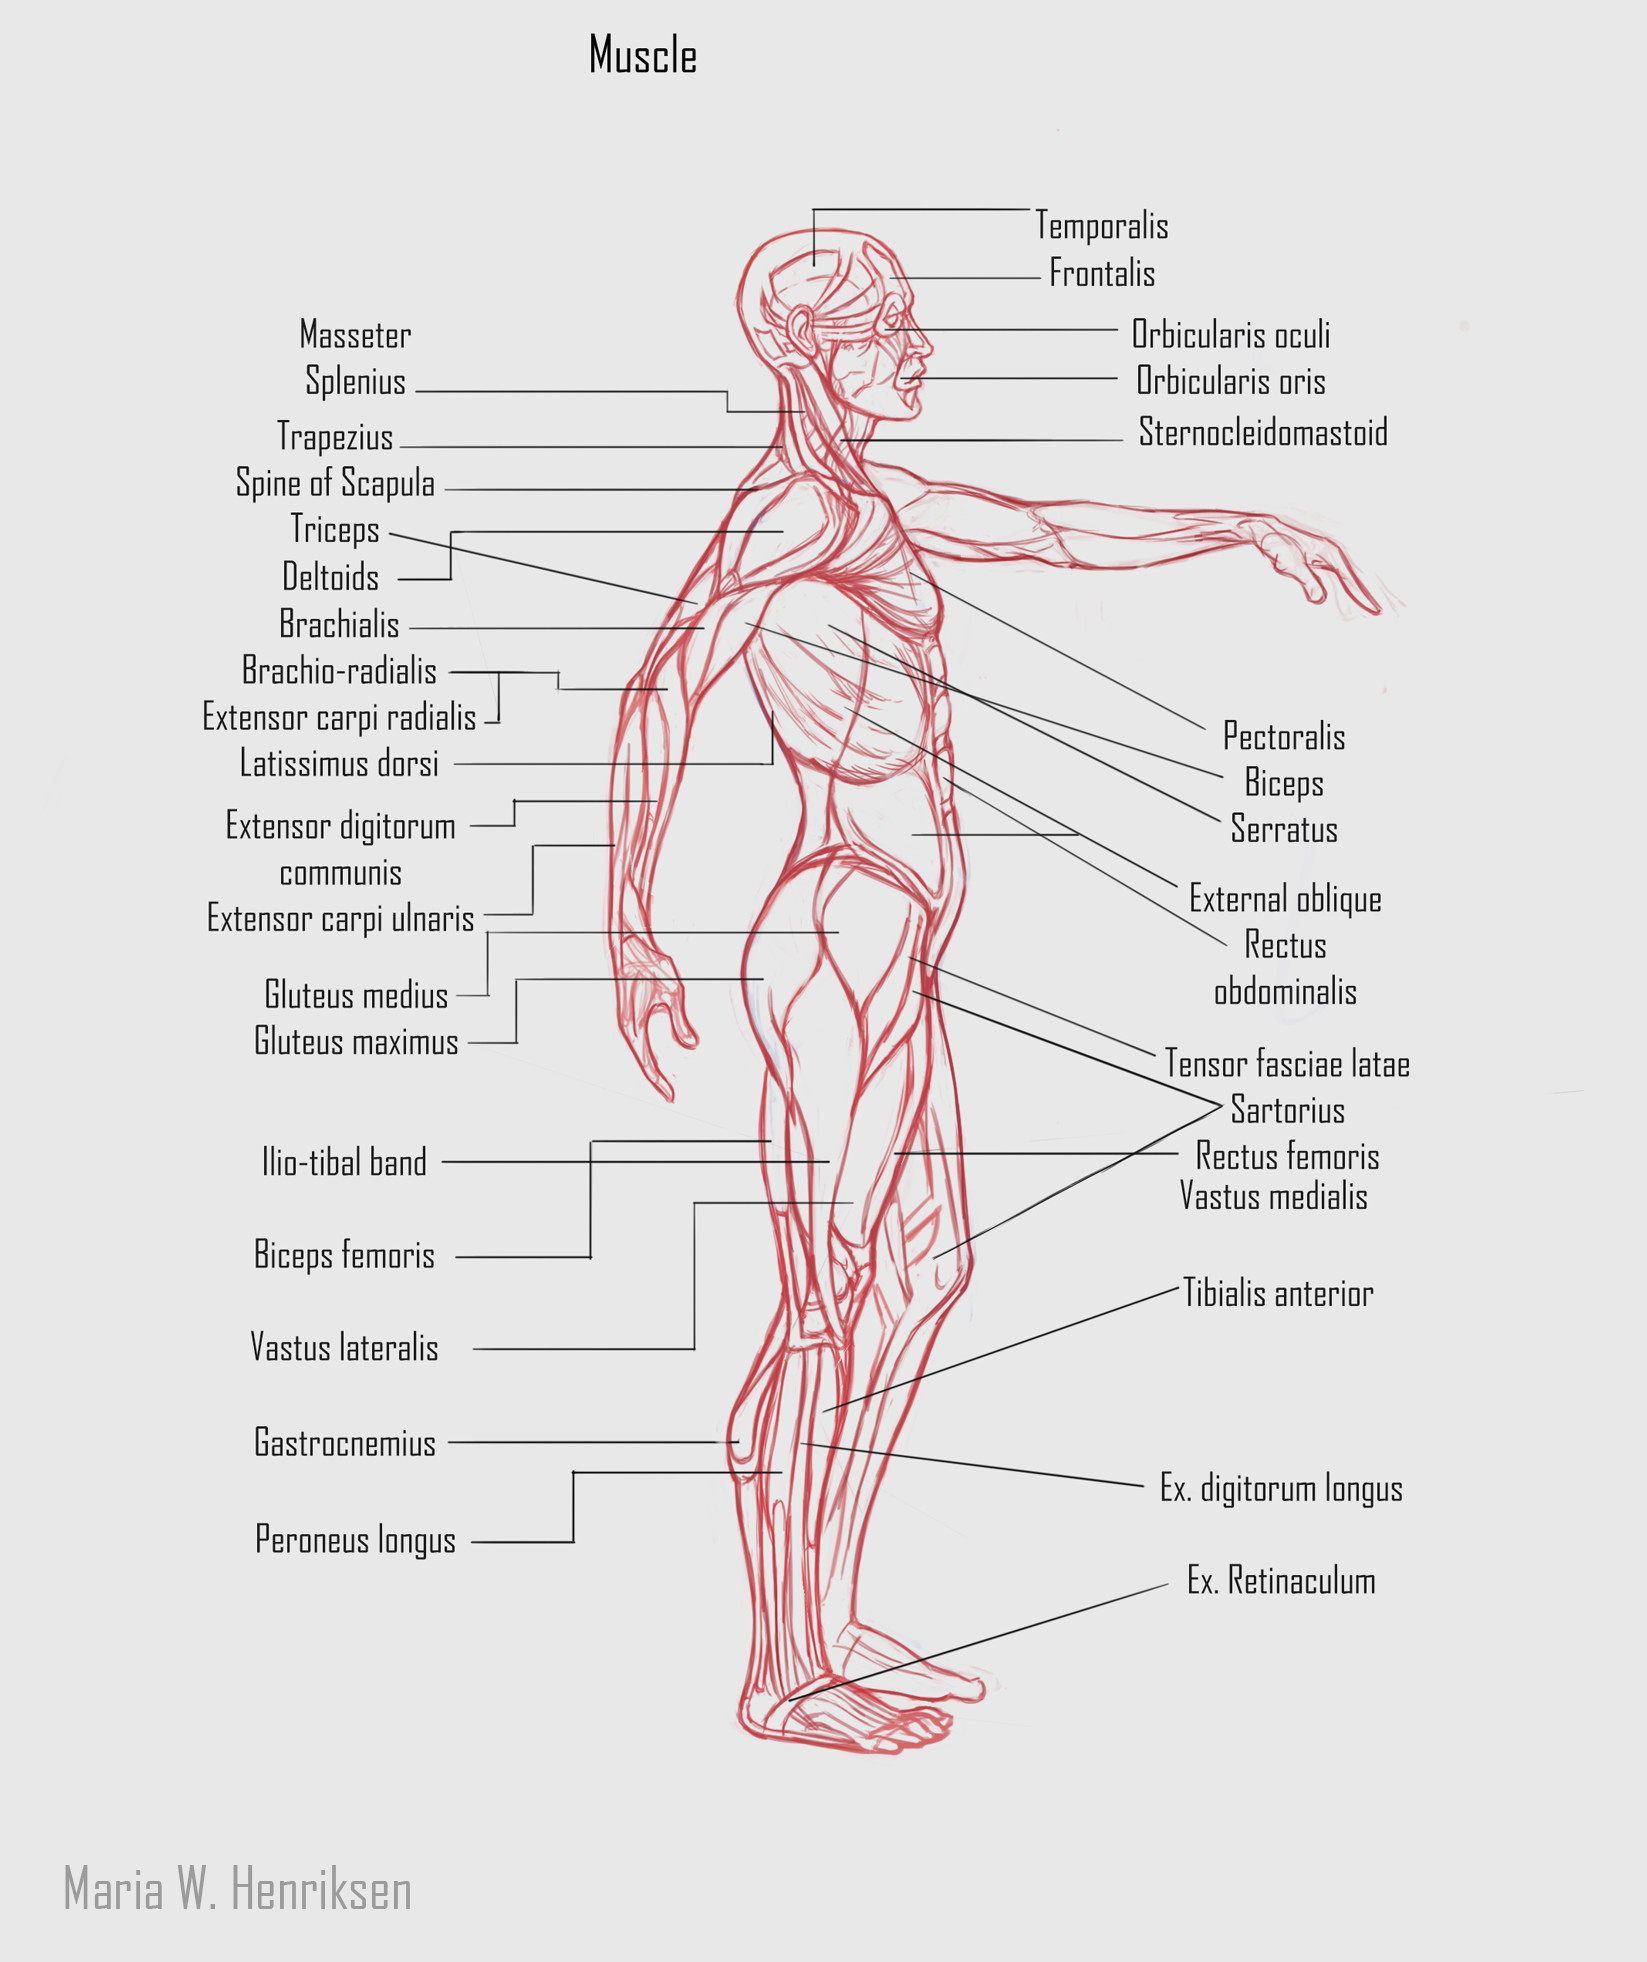 Maria W Henriksen Creature Anatomy Course Assignment 01 Human